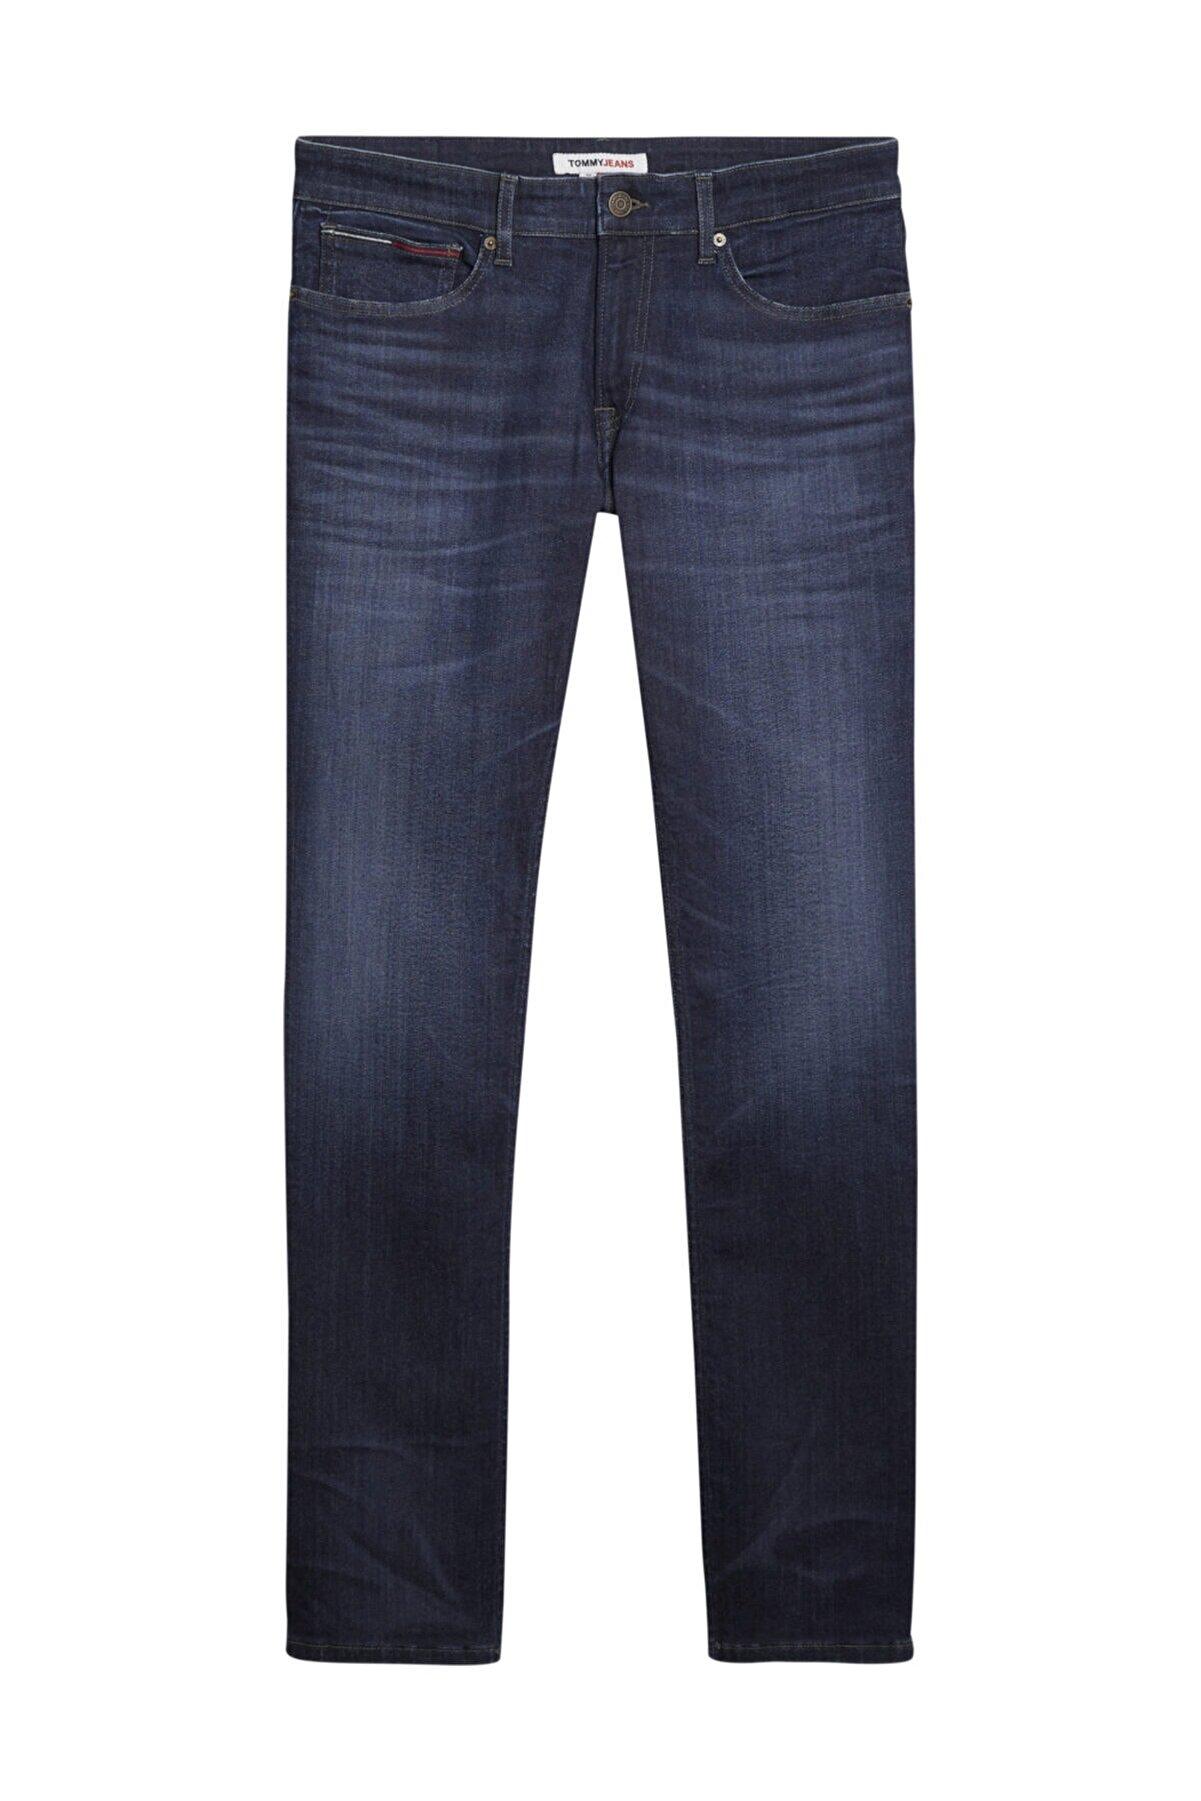 Tommy Hilfiger Erkek Denim Jeans Scanton Slım Qdbst DM0DM09317